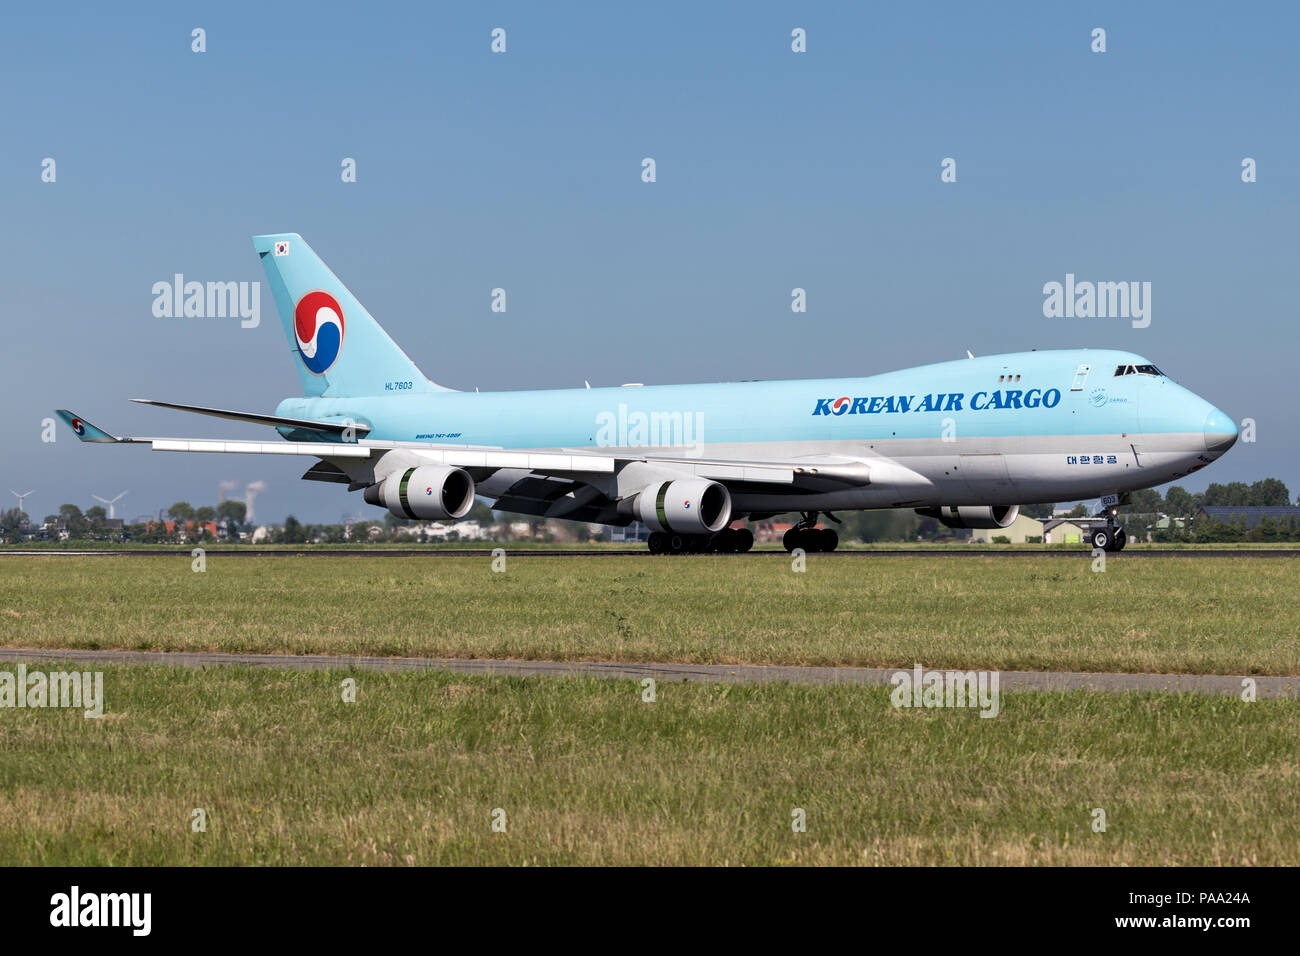 Korean Air Cargo Boeing 747-400F with registration HL7603 just landed on runway 18R (Polderbaan) of Amsterdam Airport Schiphol. - Stock Image